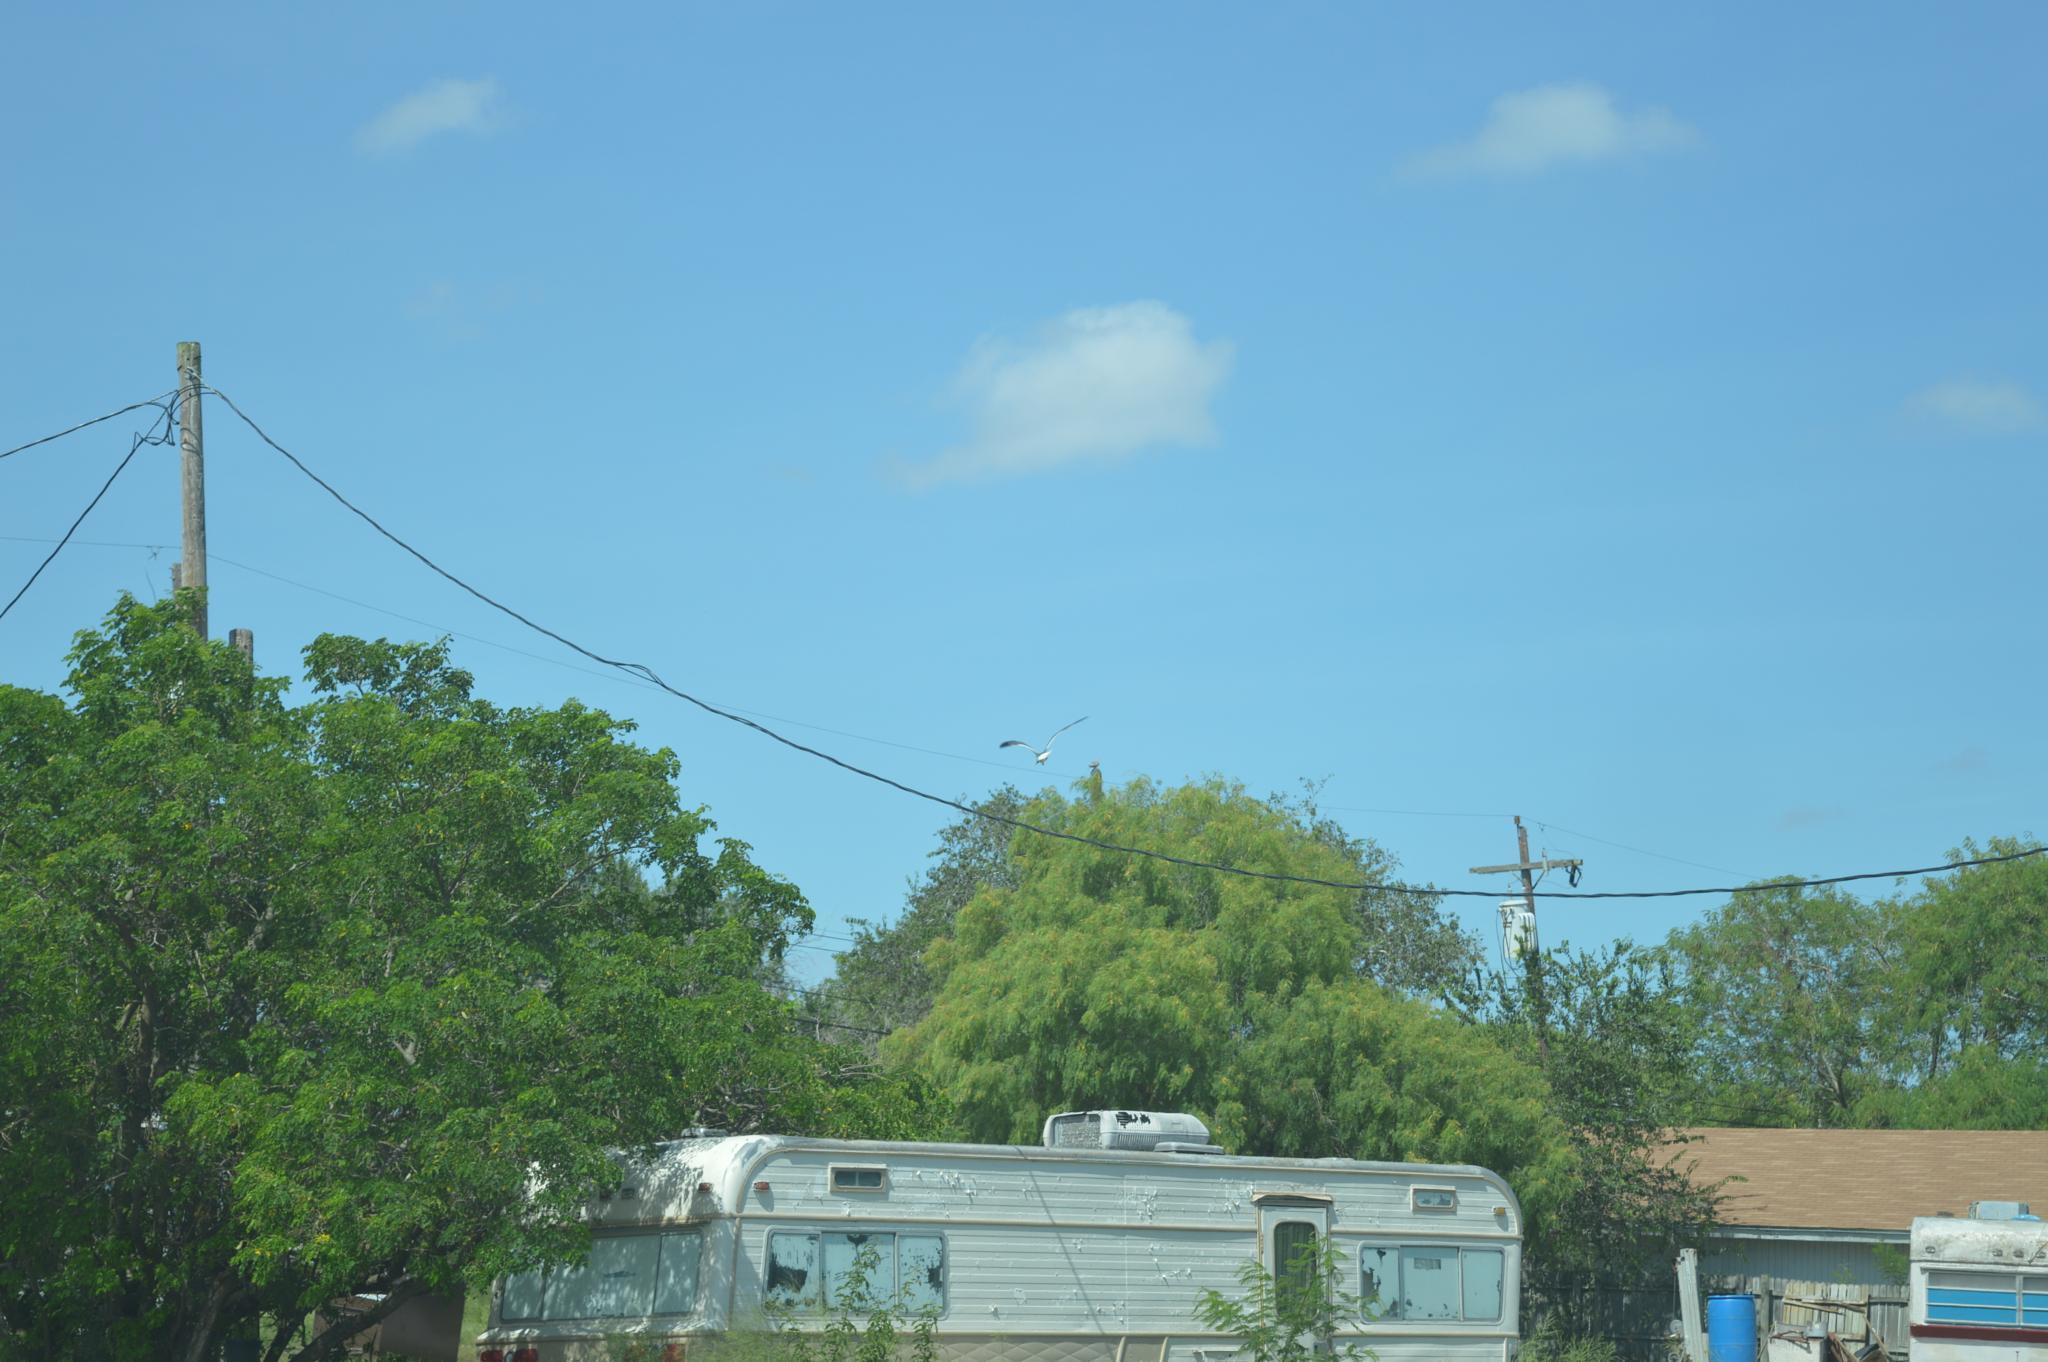 Kingsville Texas by barbarasingscntry23